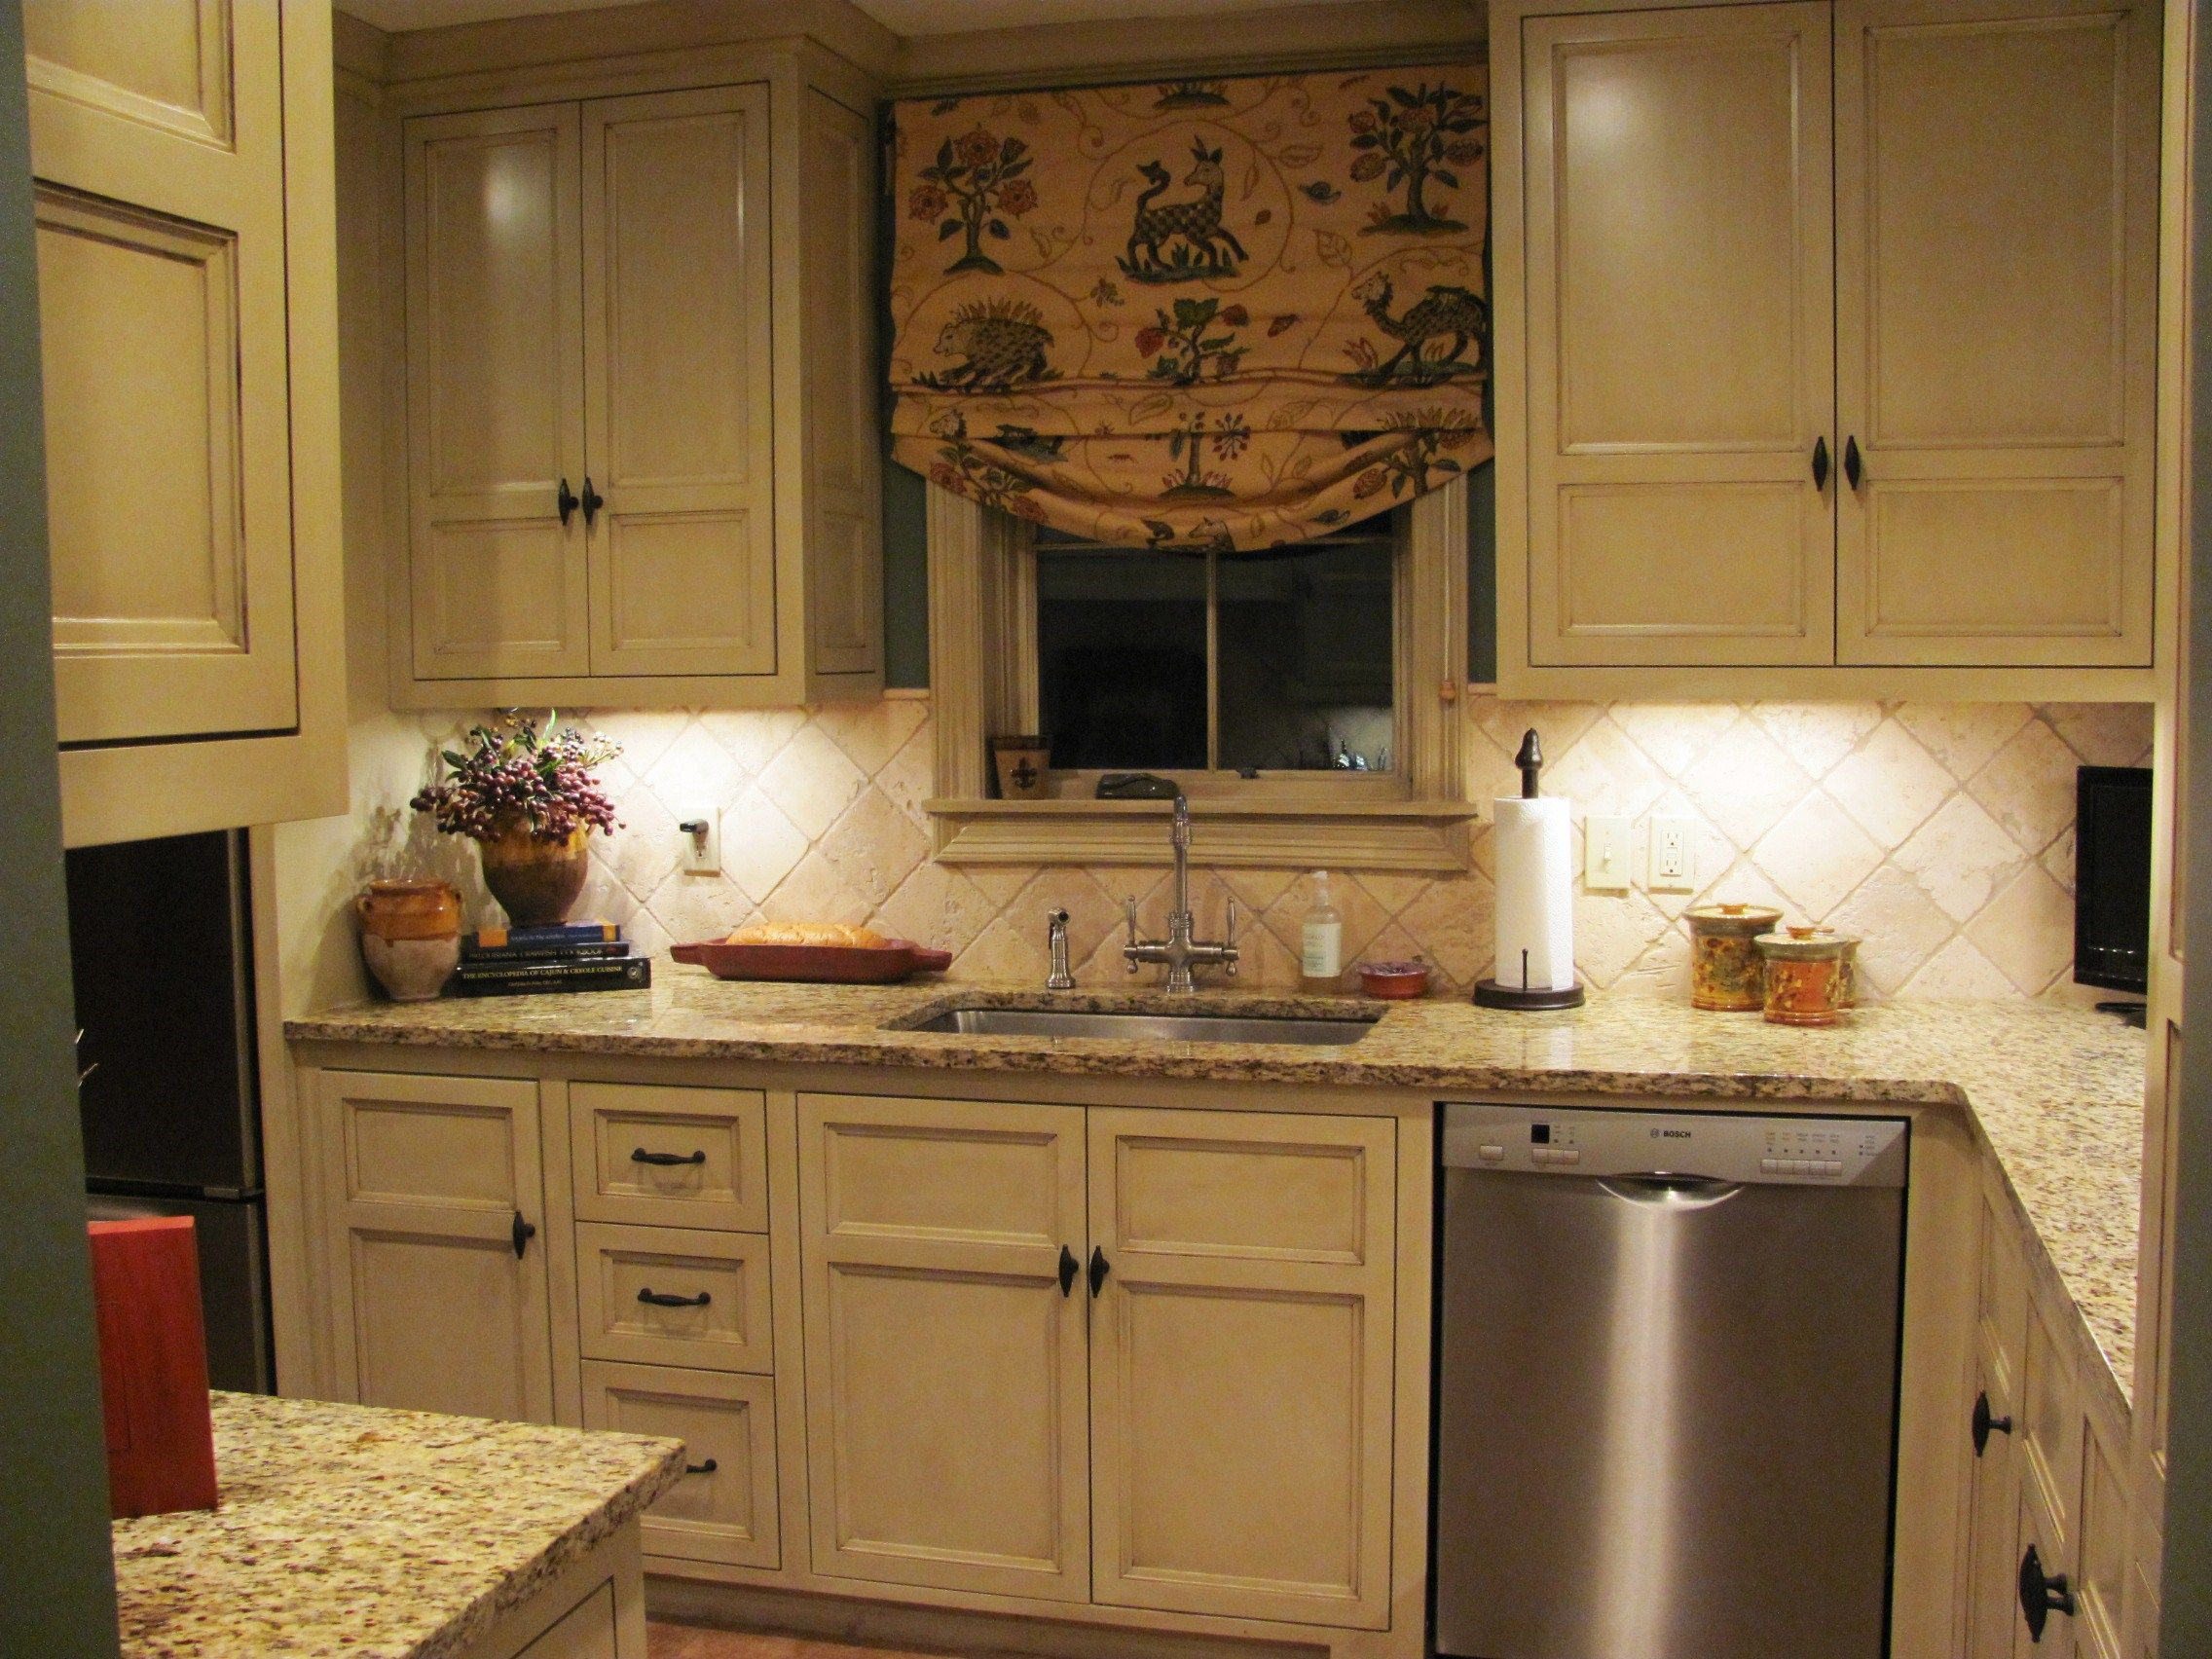 Kitchen Design Granite Fair Kitchen Design Byn Adi Cabints And Graniteken Leger  For The Design Inspiration